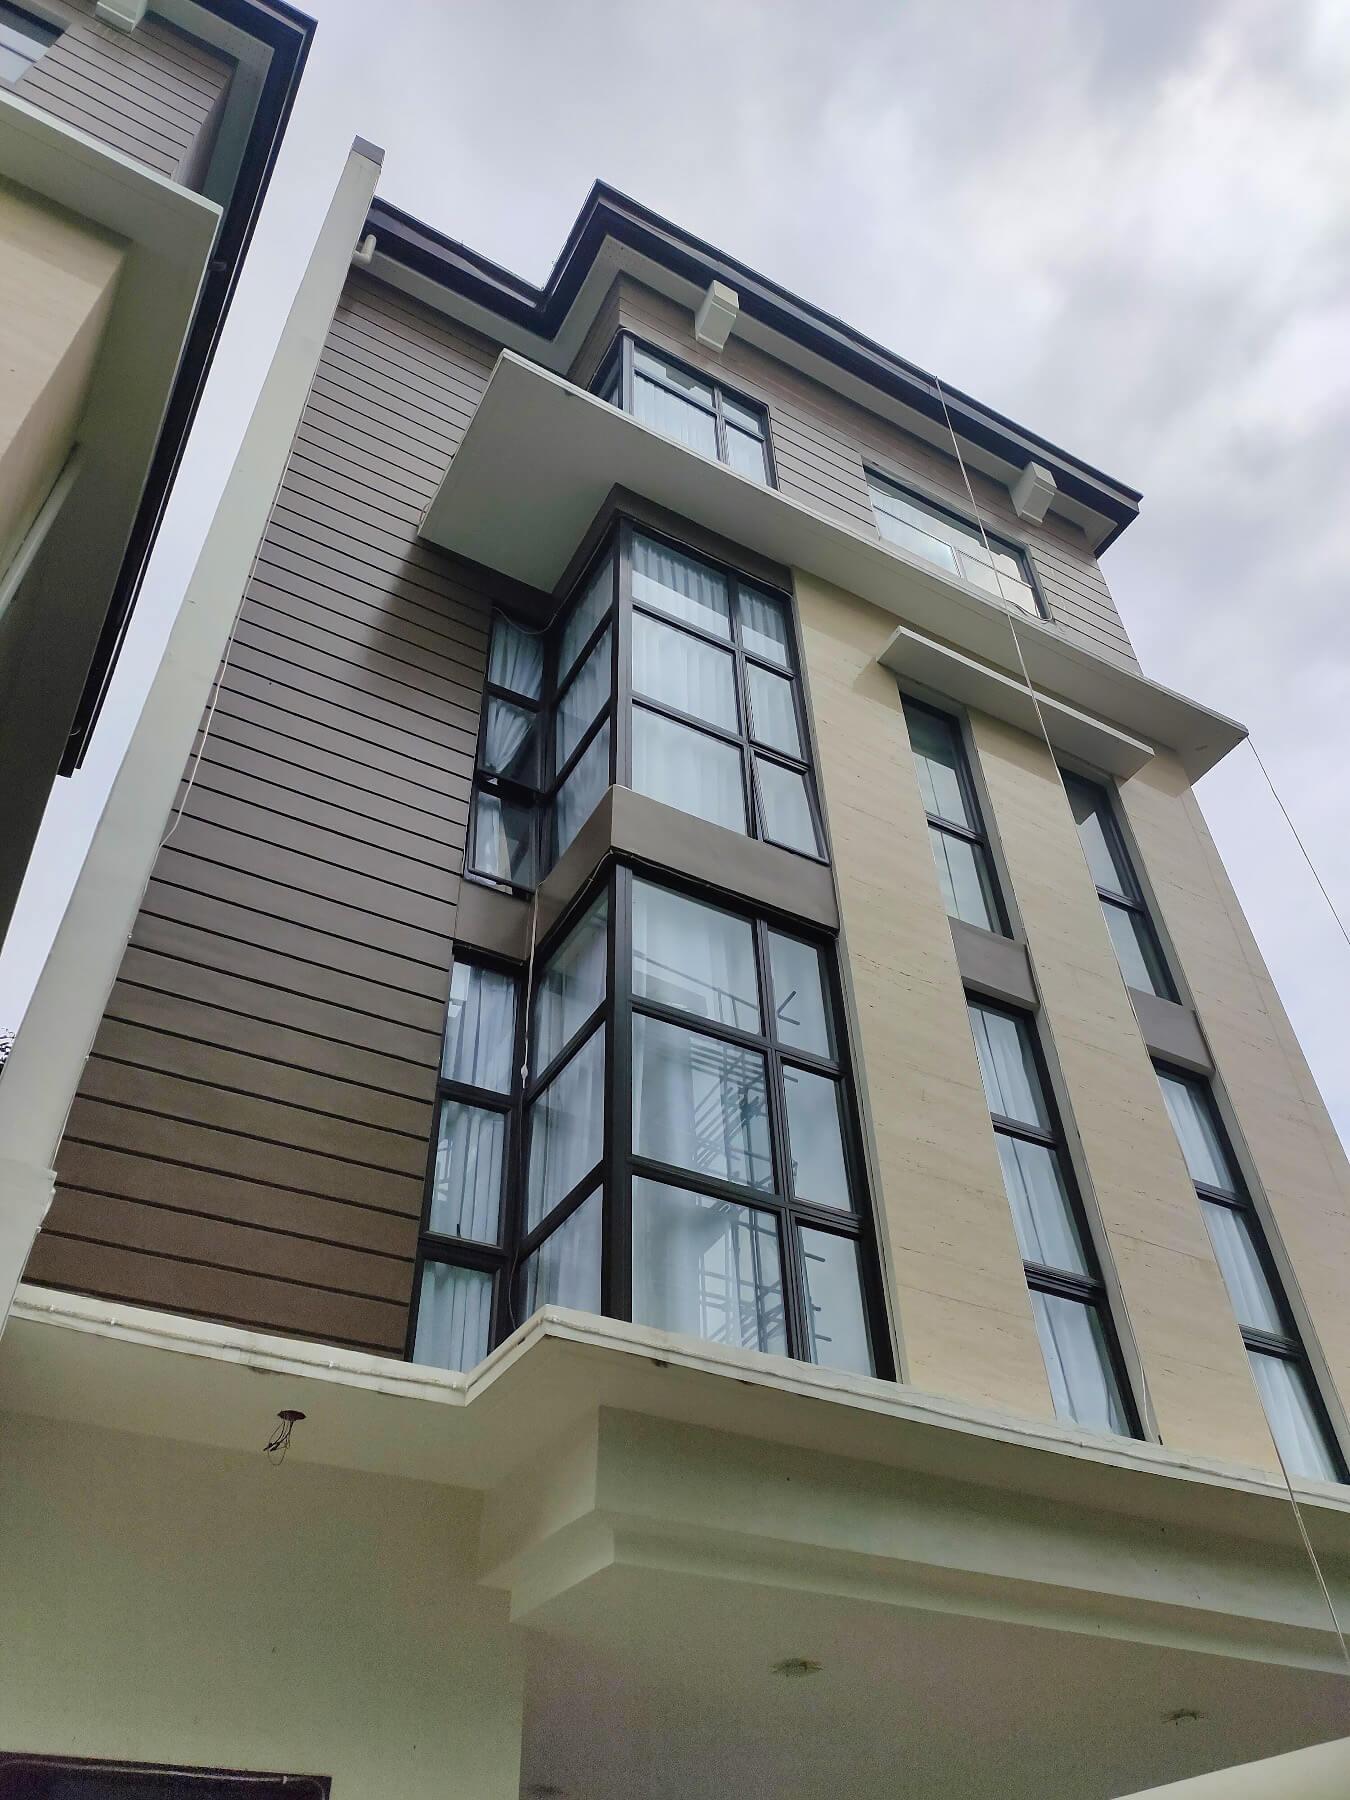 Brizlane Residences - Unit 5 exterior